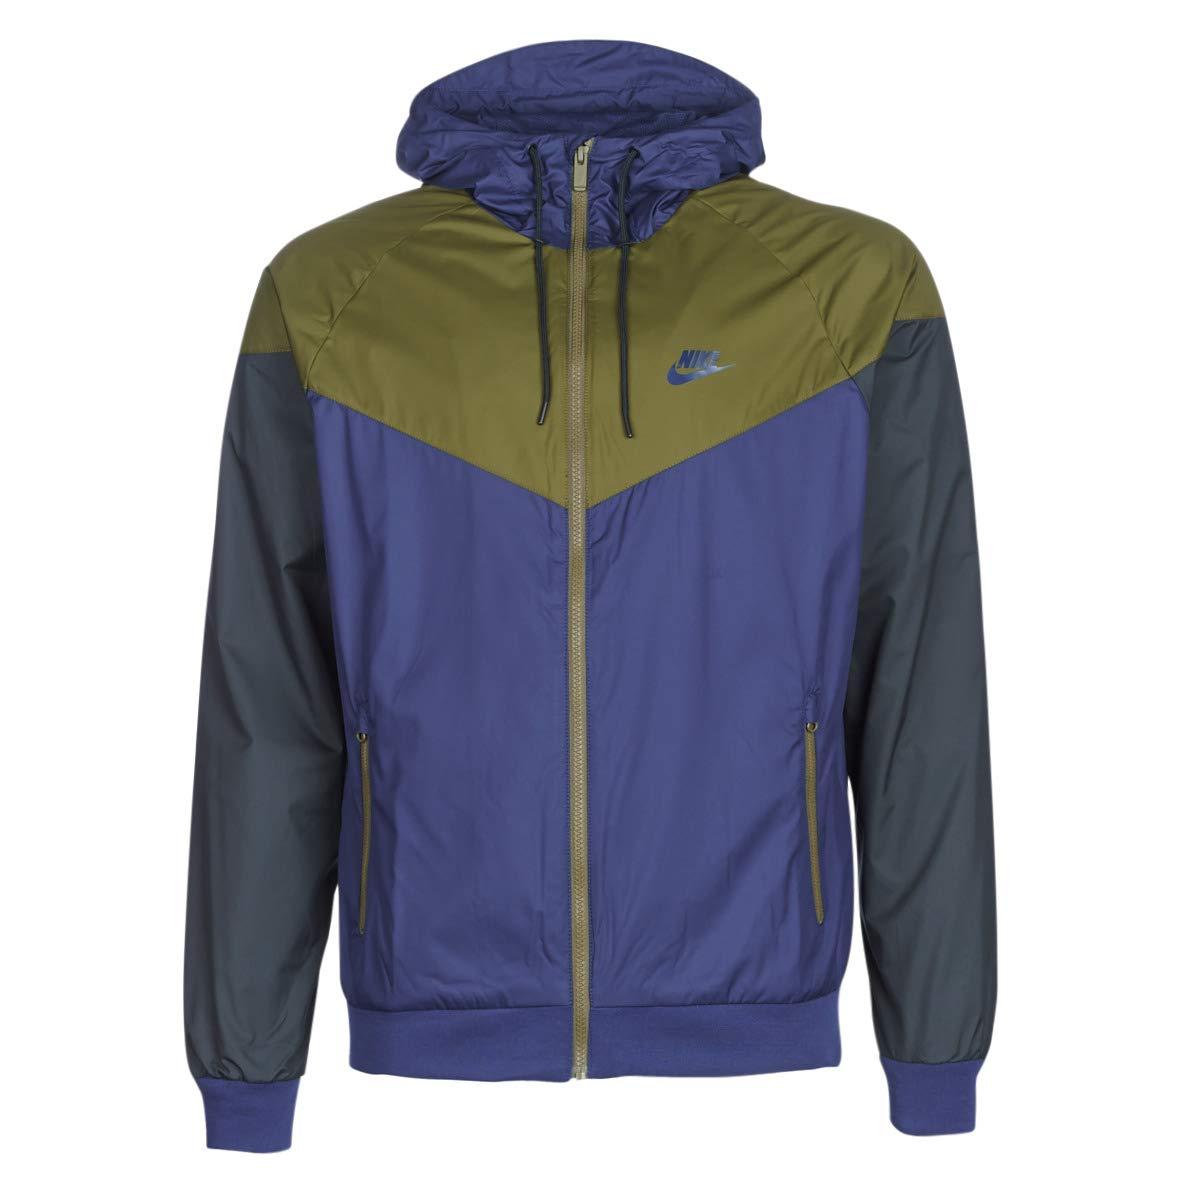 b24a14078f95 Nike Sportswear Windrunner Mens Hooded Jacket  Amazon.ca  Sports   Outdoors